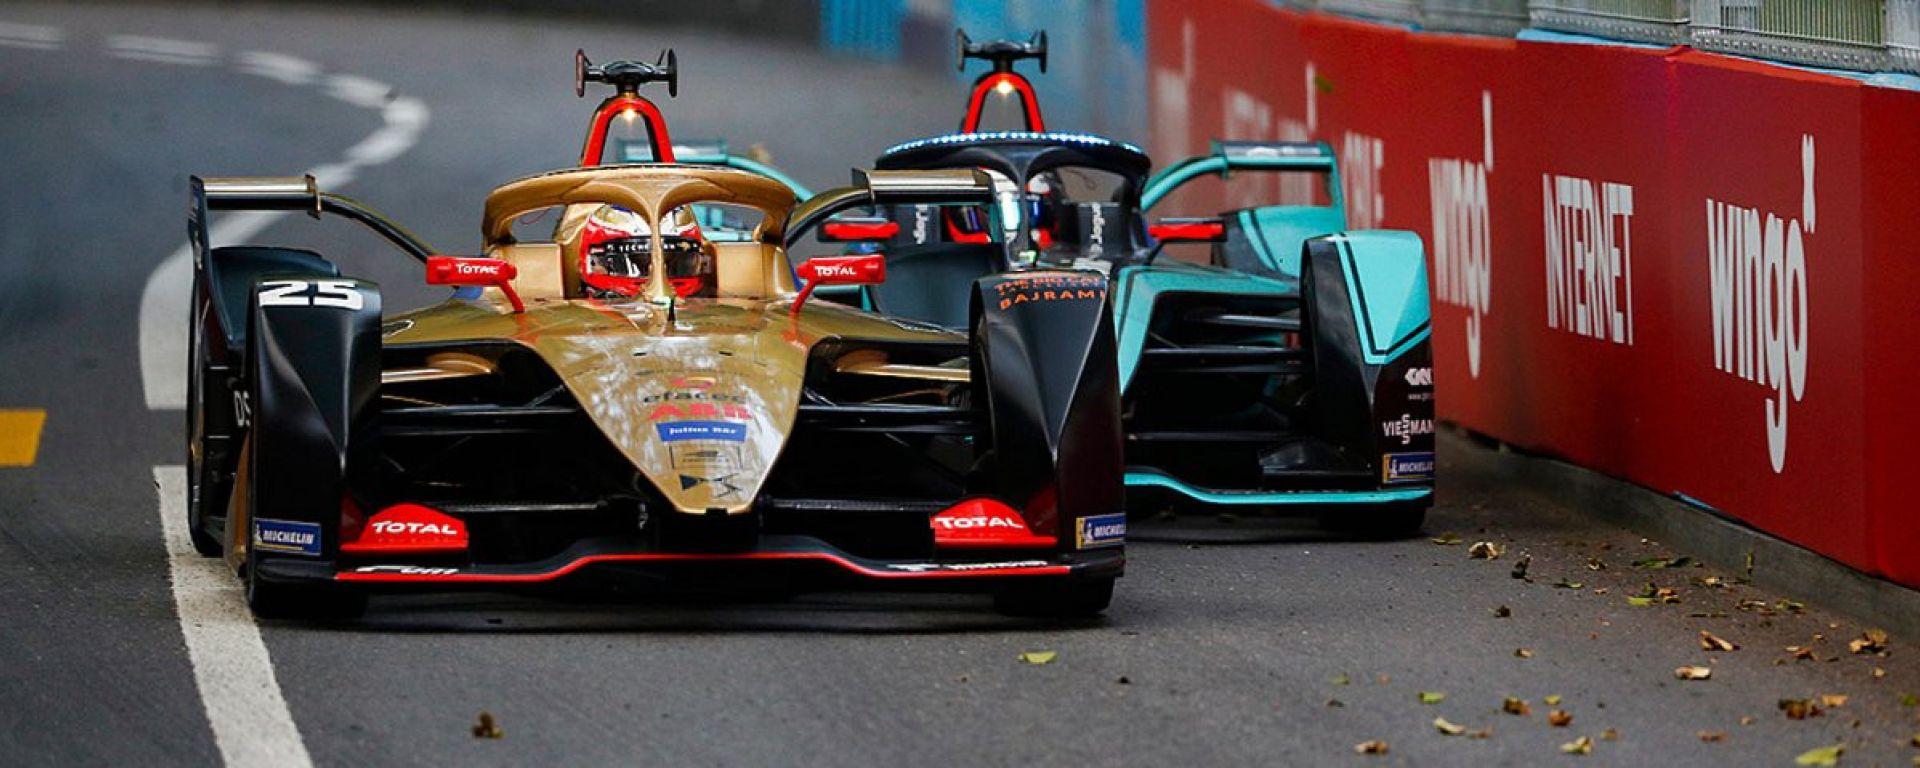 ePrix Berna, Jean Eric Vergne (DS Techeetah) vince la gara